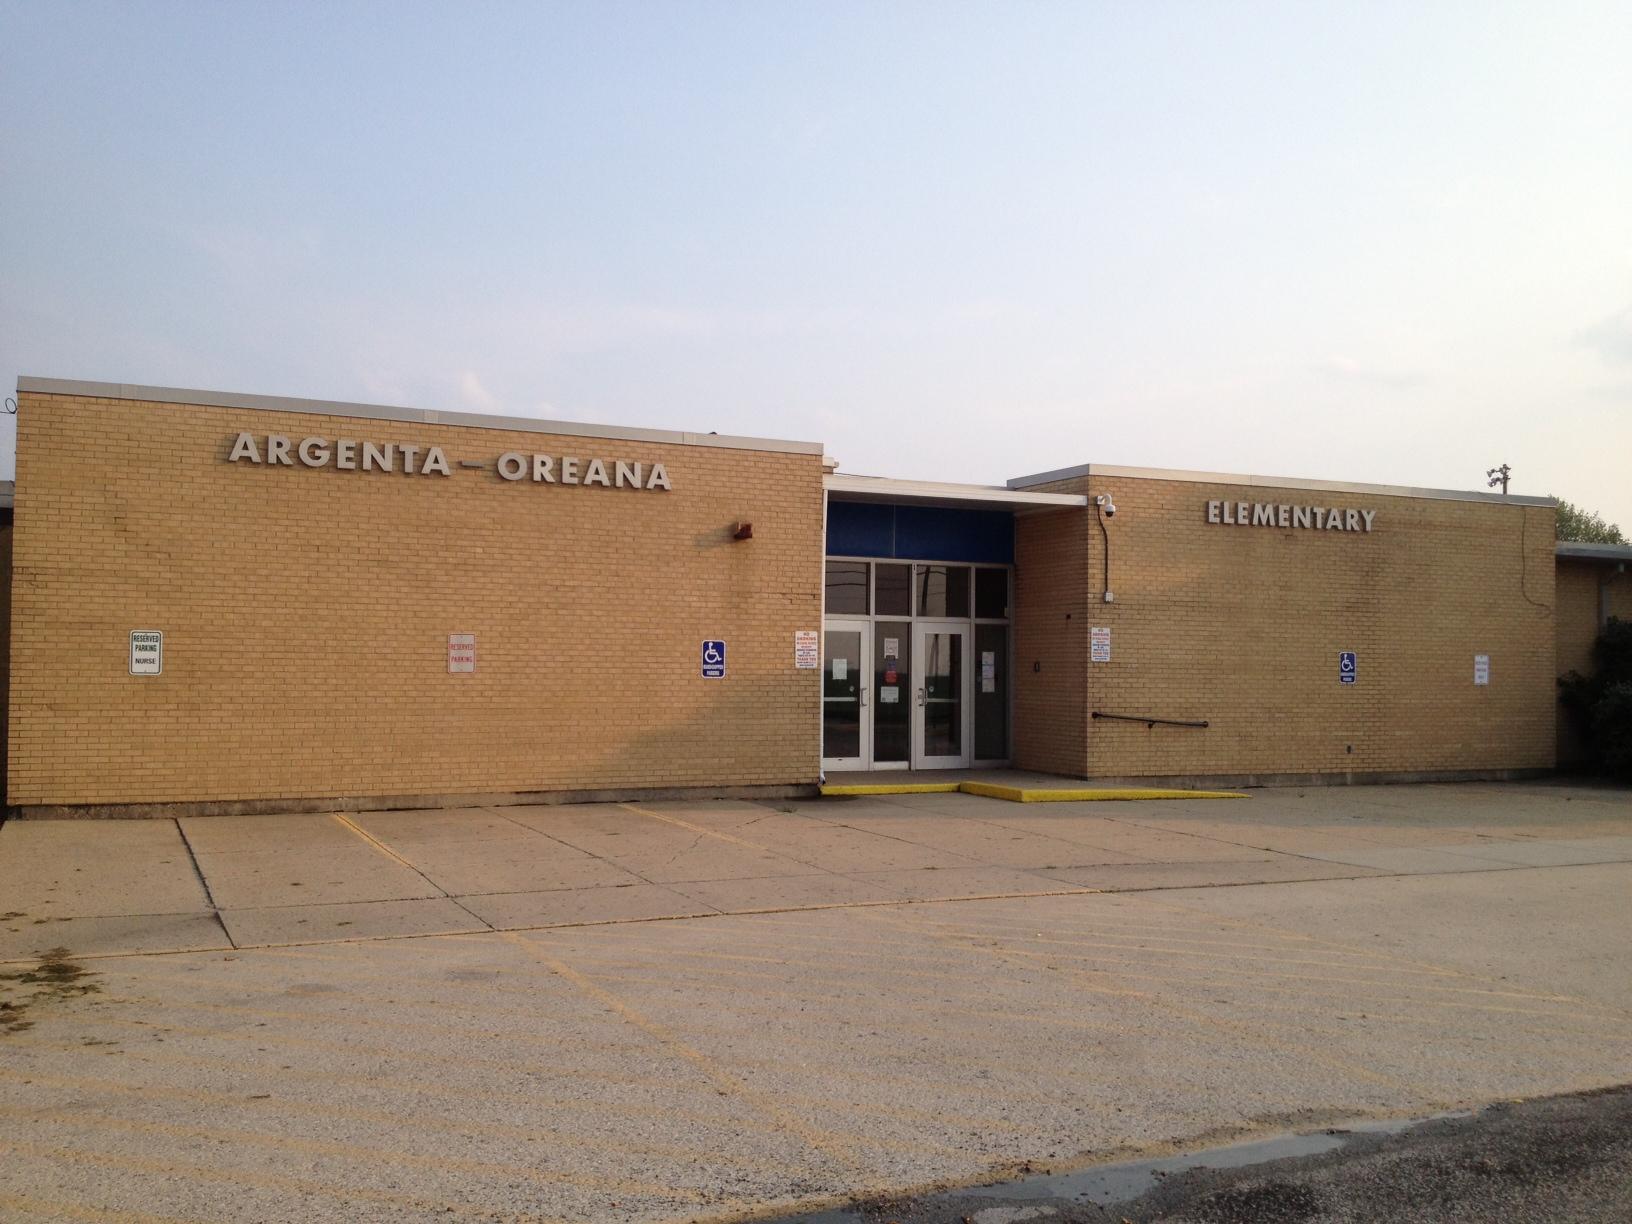 A-O Elementary